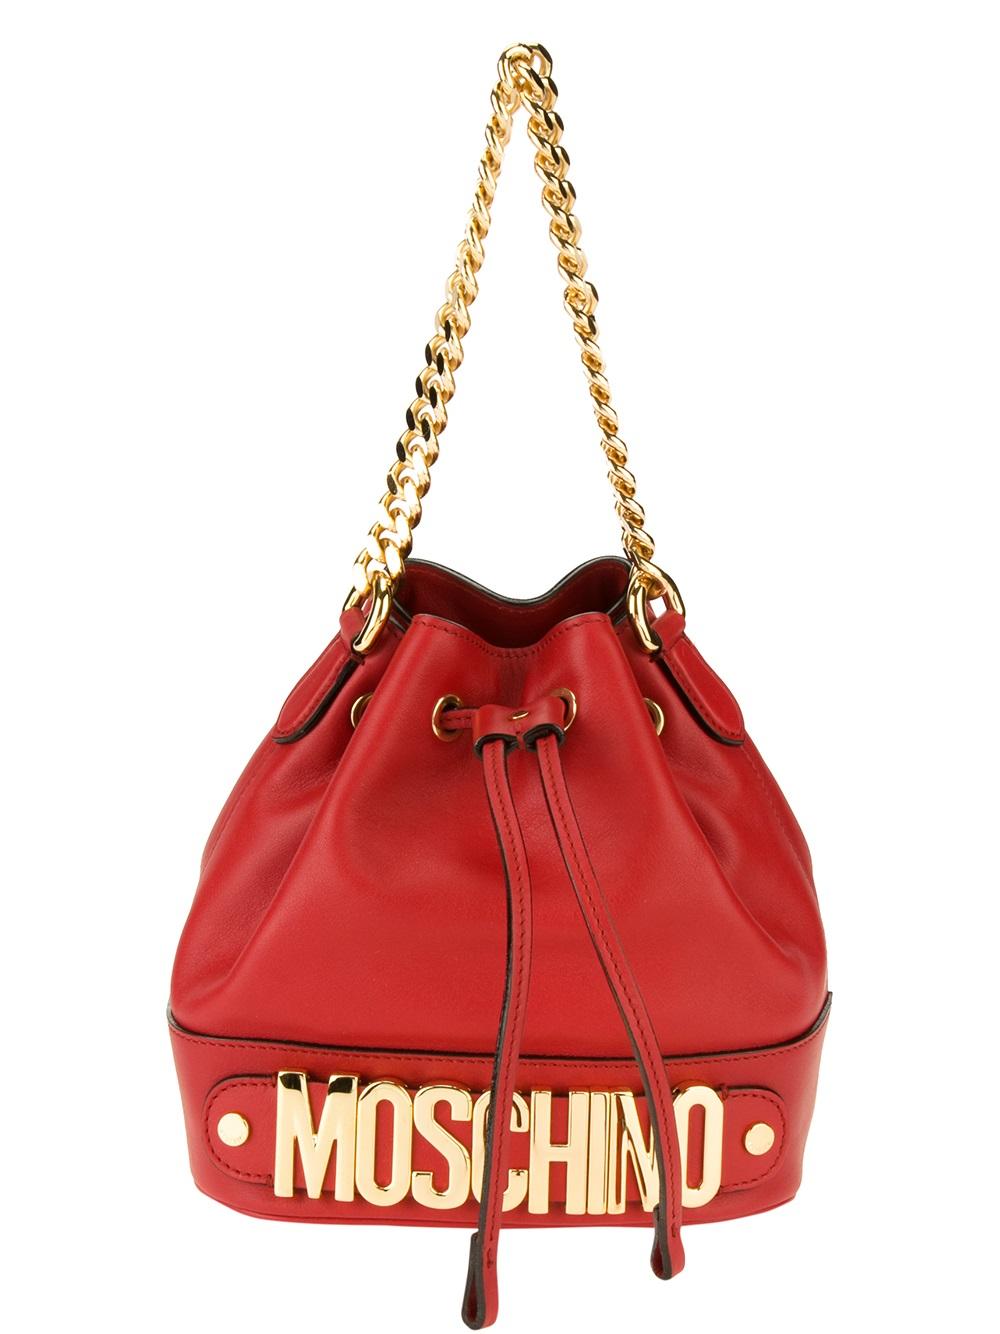 a9a1b664ed80a Moschino Logo Bucket Bag in Red - Lyst